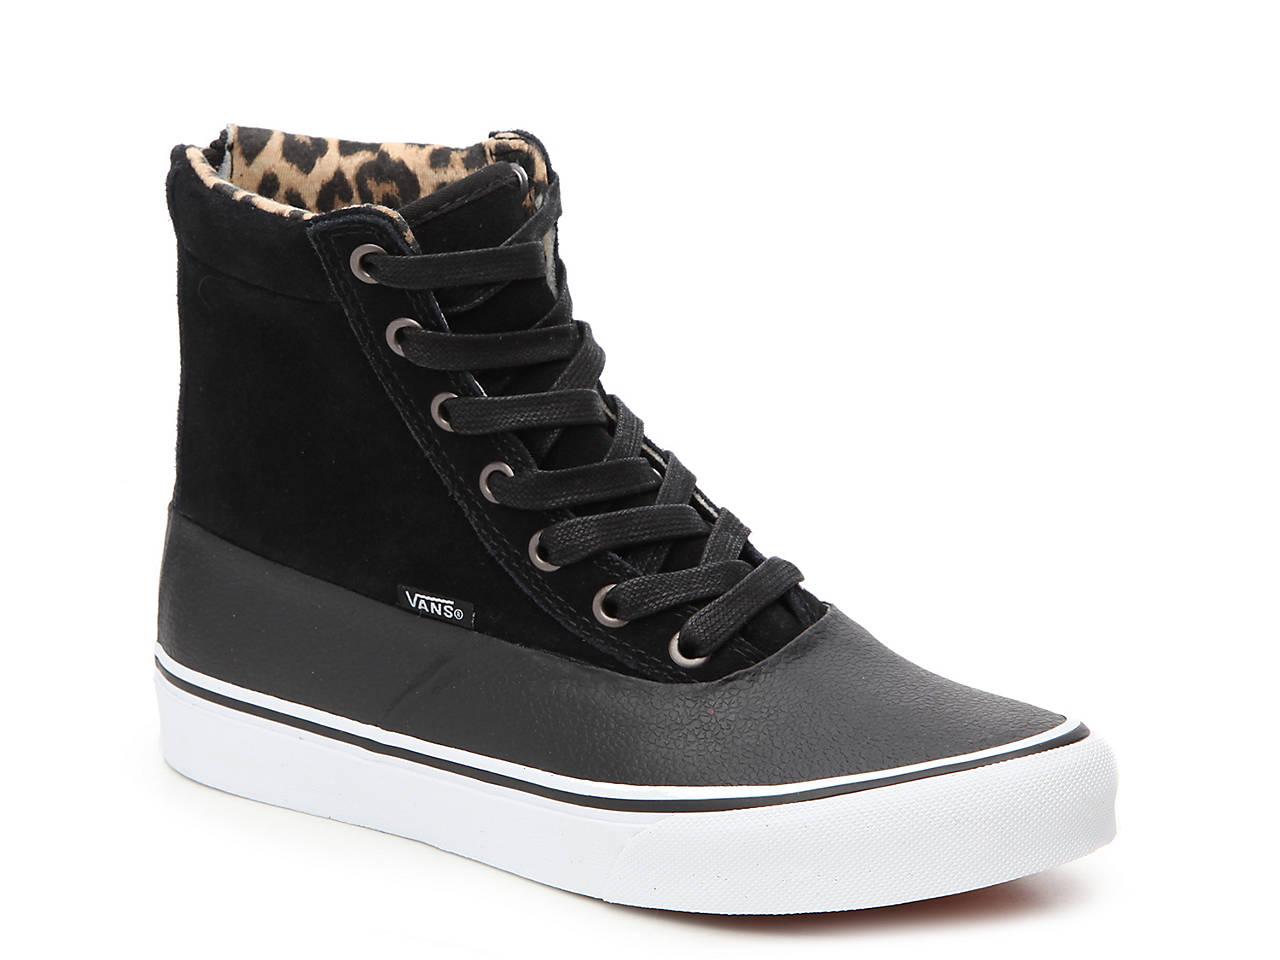 9014b15fb09b90 Vans Camden Hi Zipper High-Top Sneaker - Women s Men s Shoes